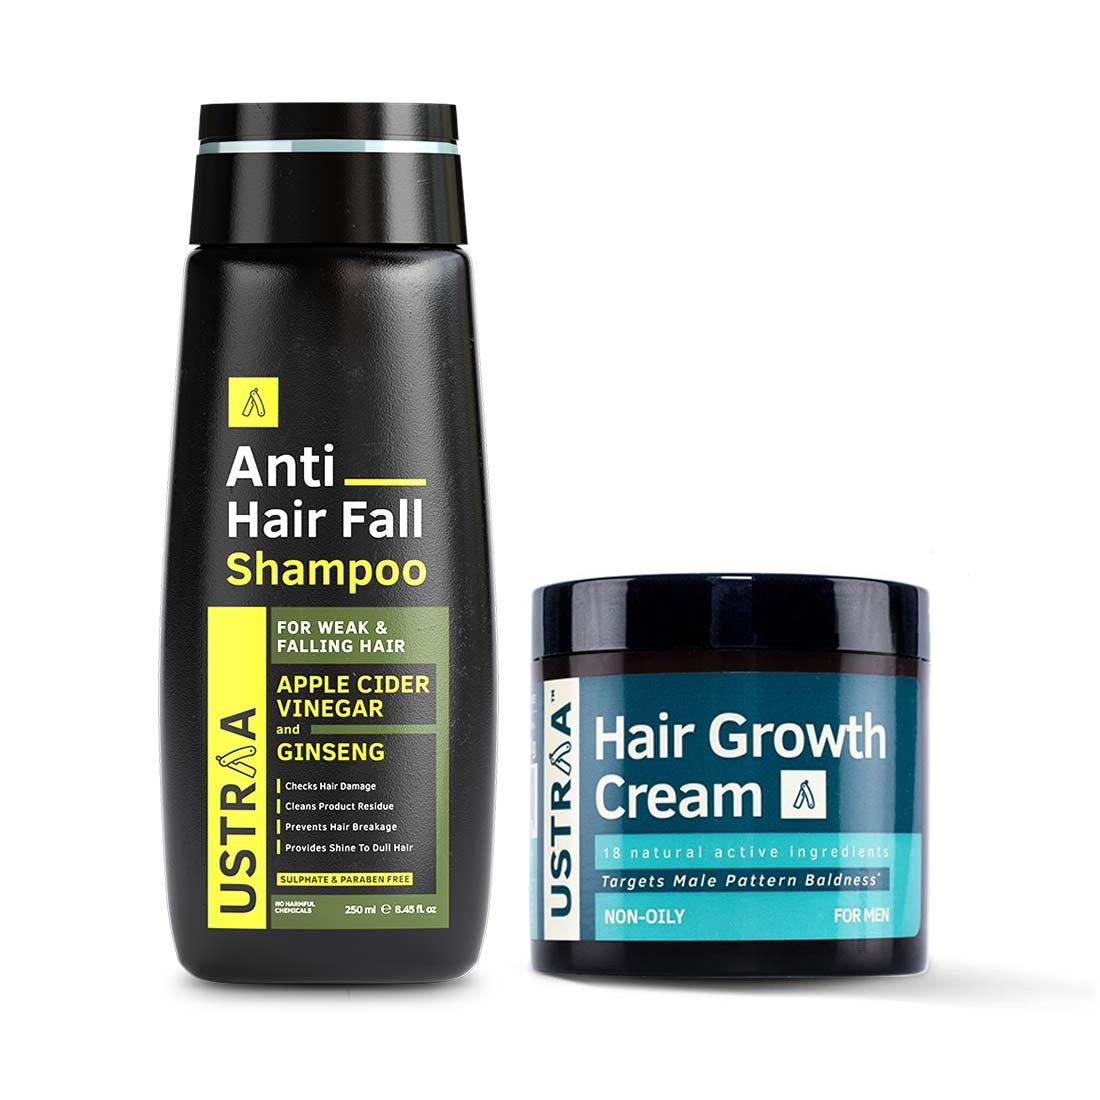 Ustraa | Ustraa   Anti hair fall shampoo 250 ml & Hair Growth Cream 100 g